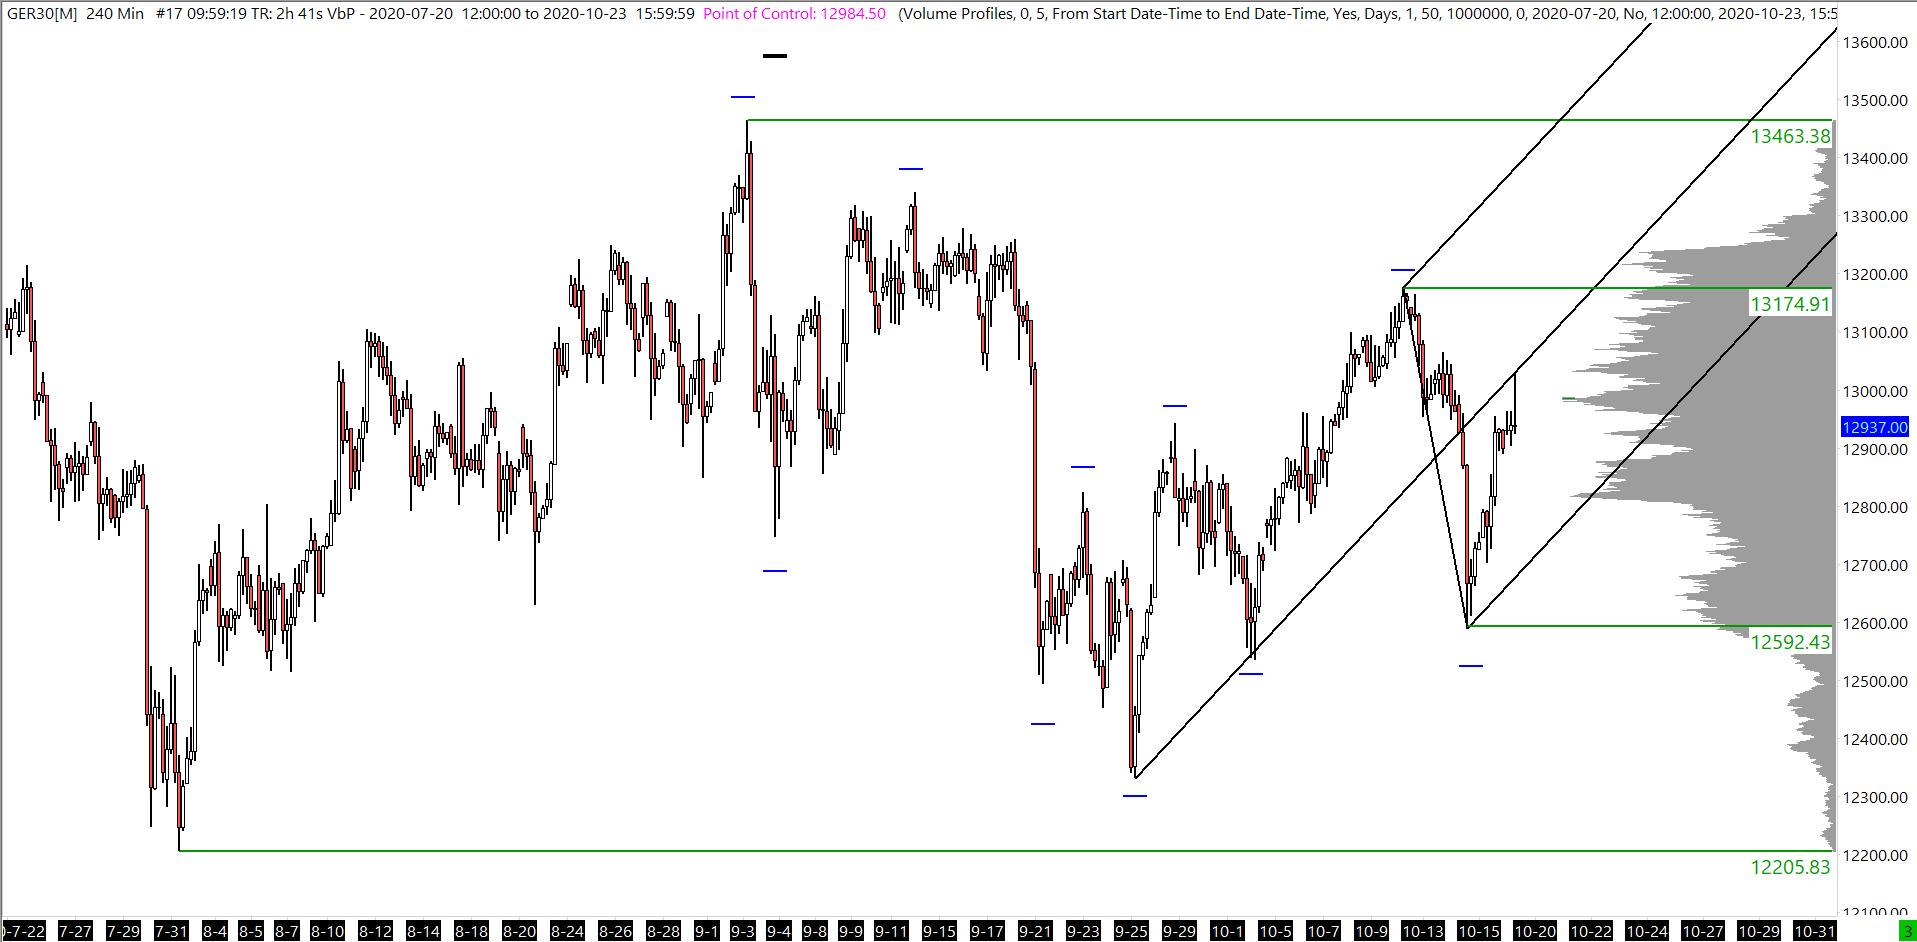 DAX Analysis - Daily Swings